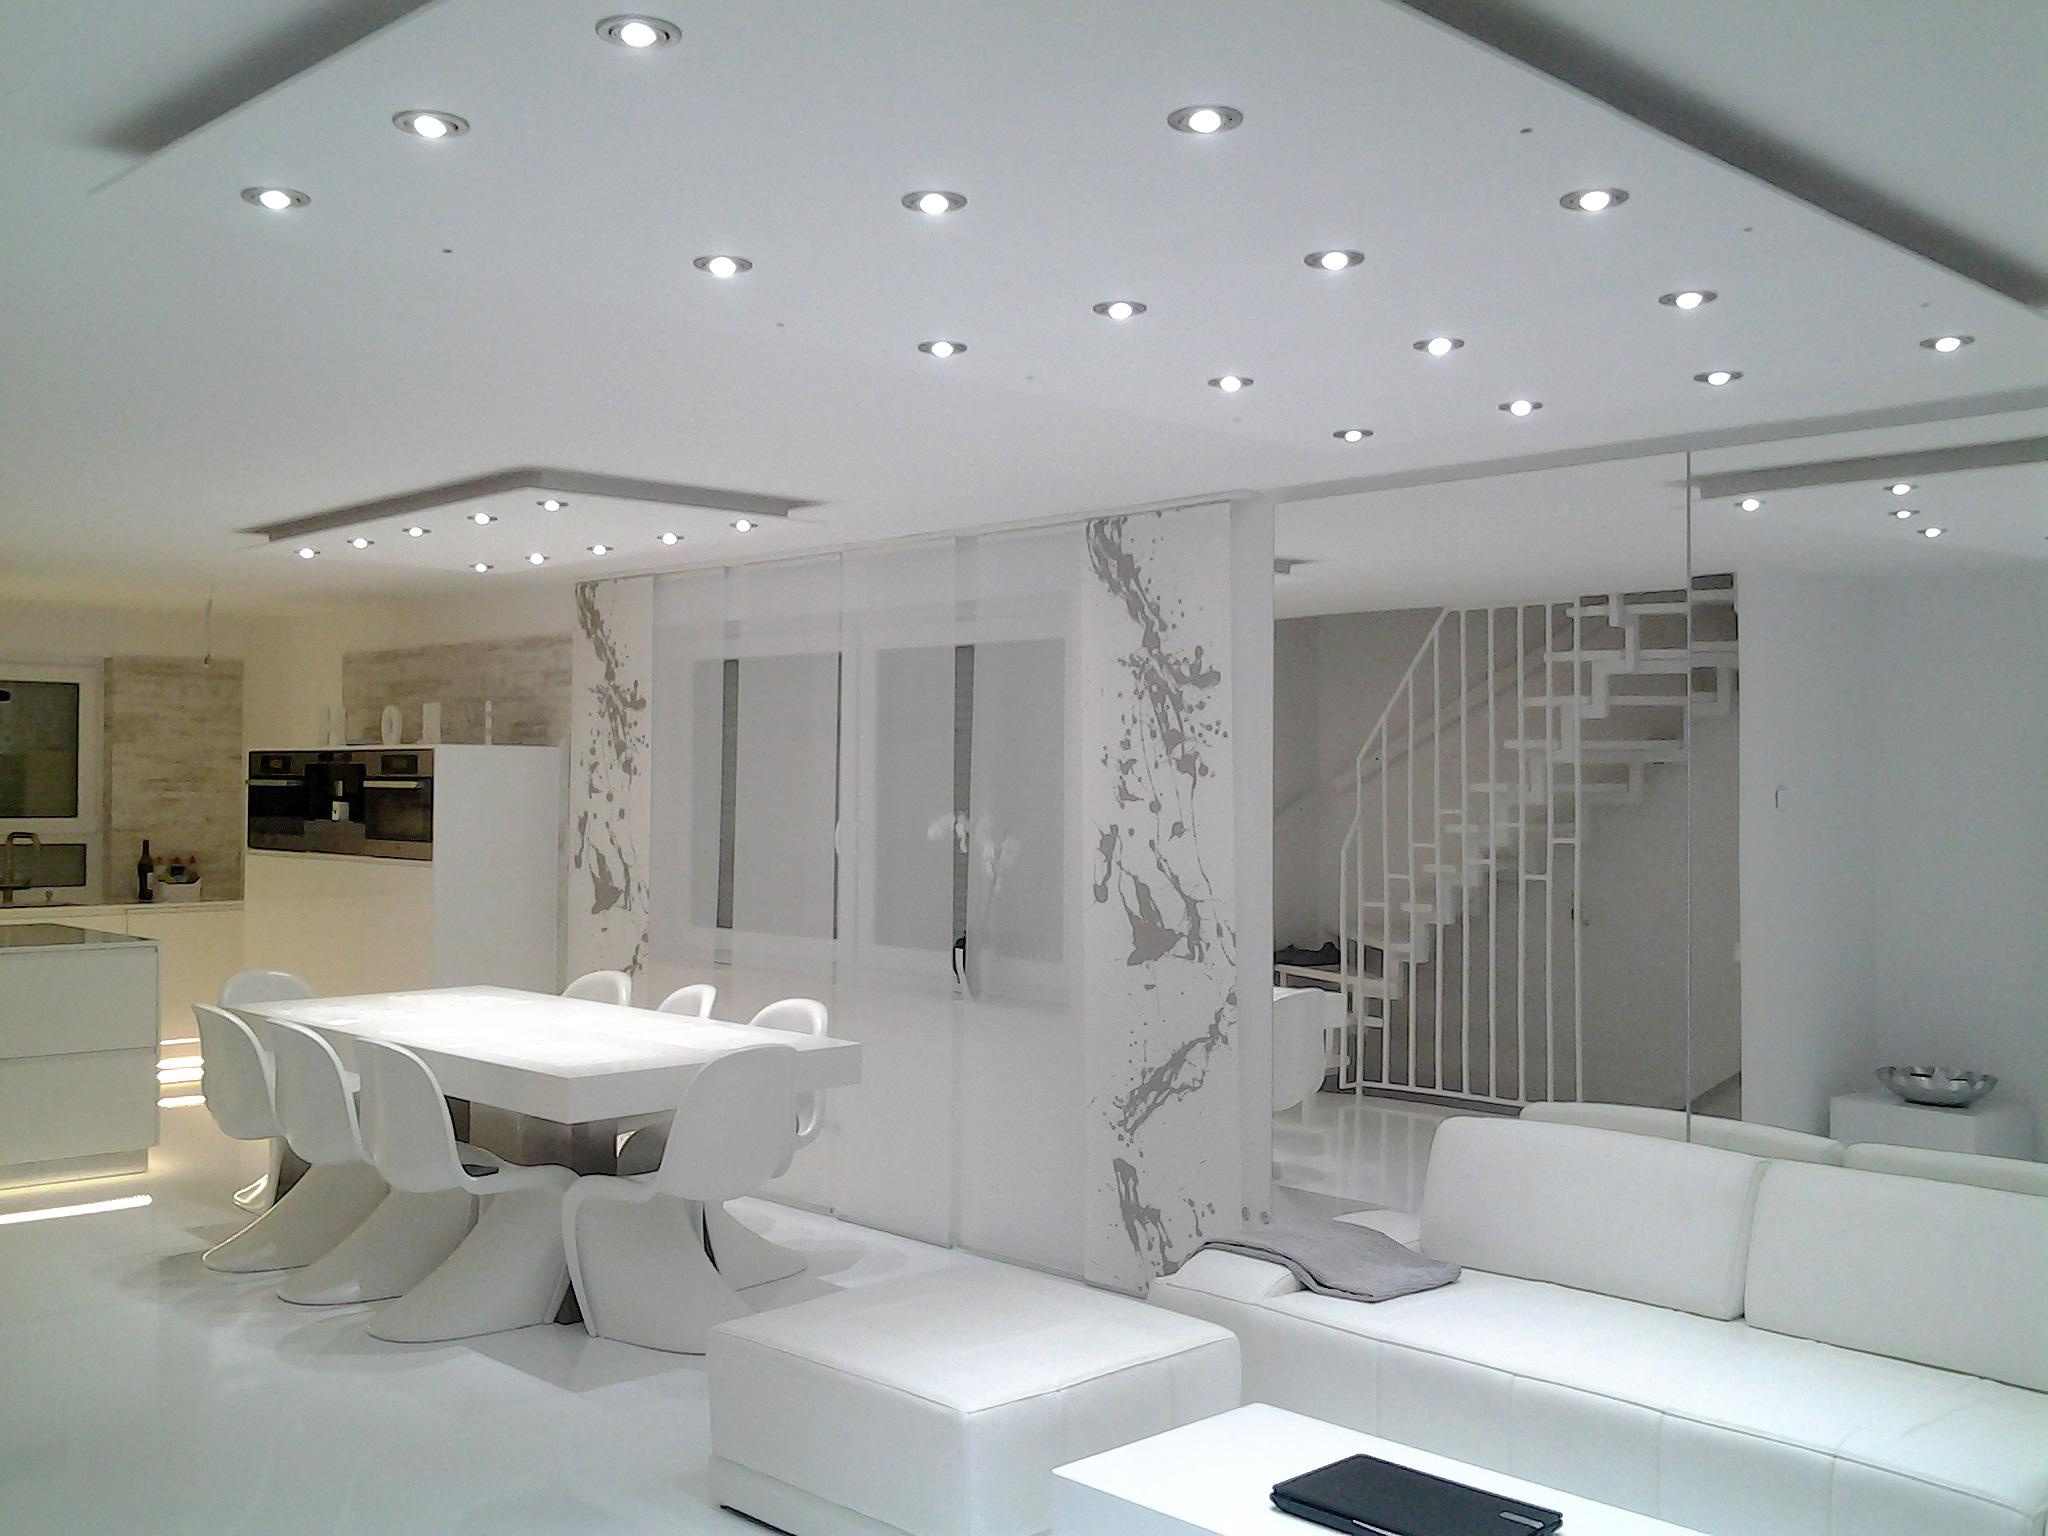 holz decke haus design bilder beautiful holz decke haus design bilder pictures home design. Black Bedroom Furniture Sets. Home Design Ideas